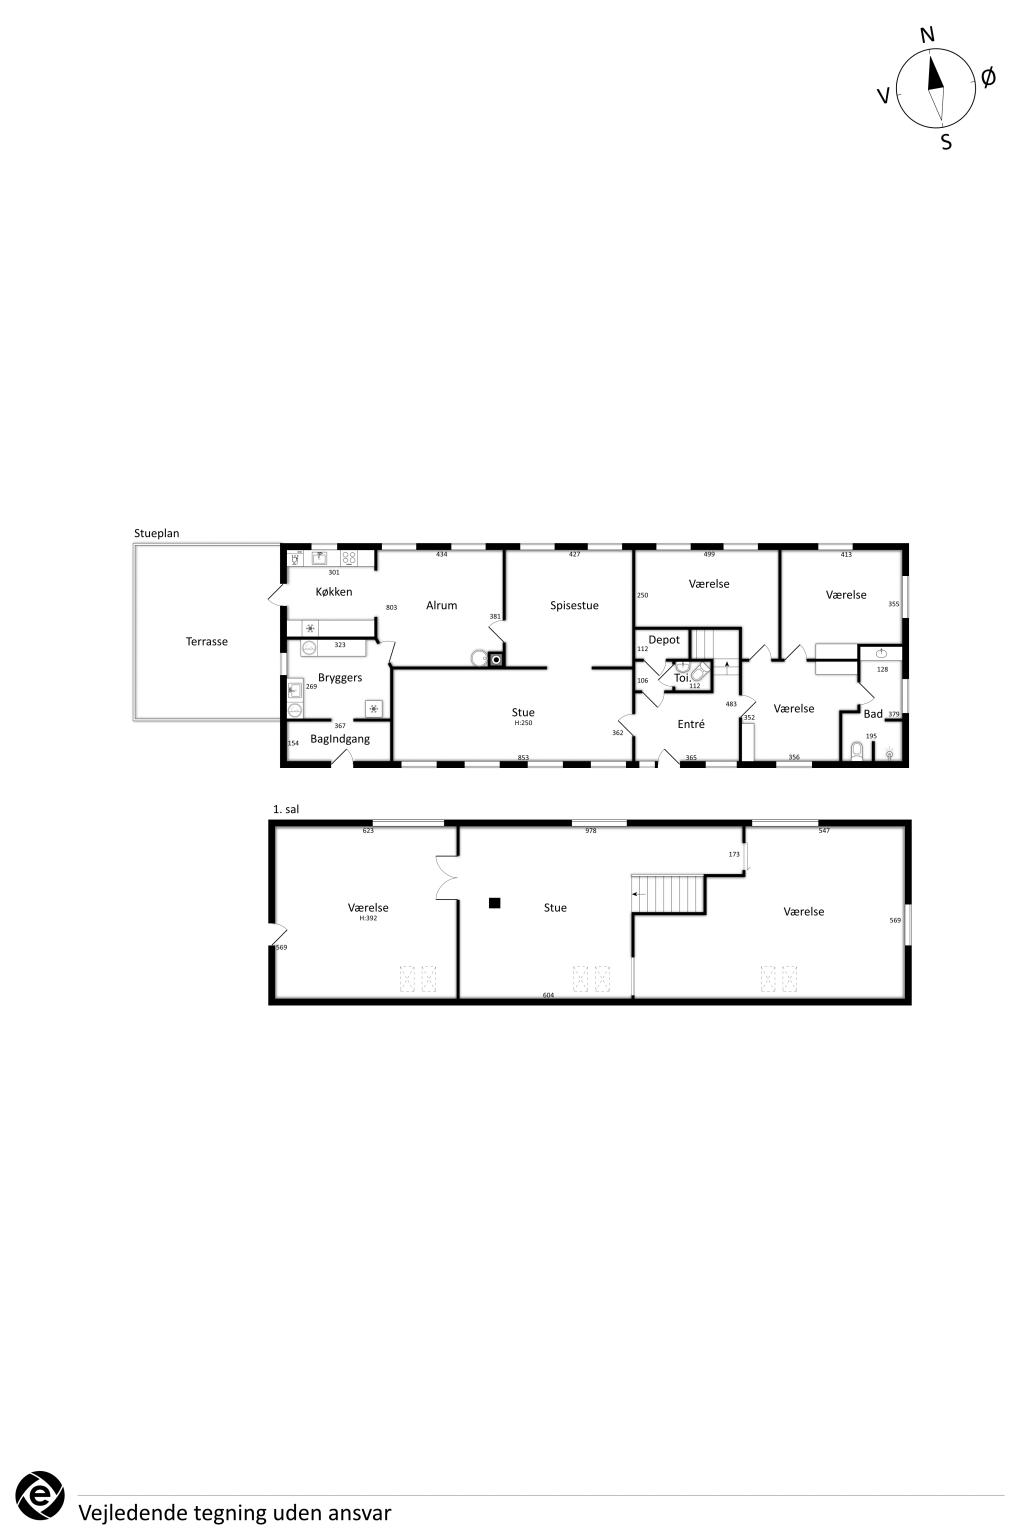 Boligprojekt med mulighed for 7 boligenheder - 199_ed2462f7f258c7ab426e989e286df1bf